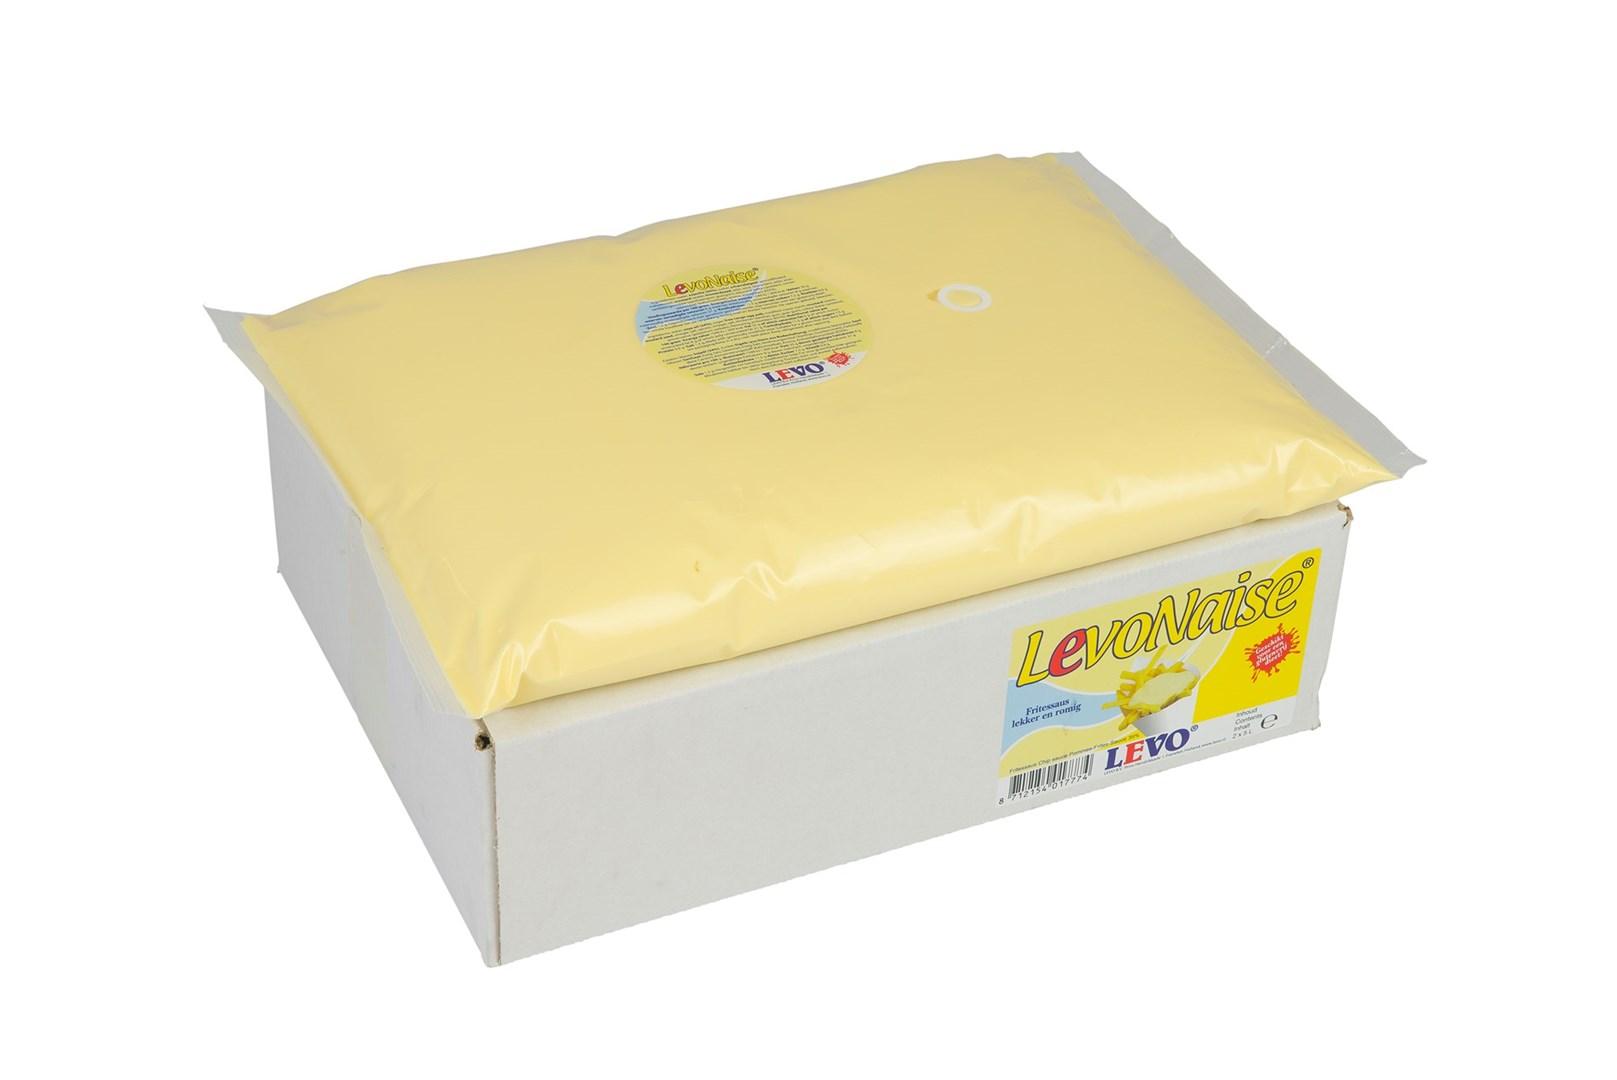 Productafbeelding LEVOnaise packzak